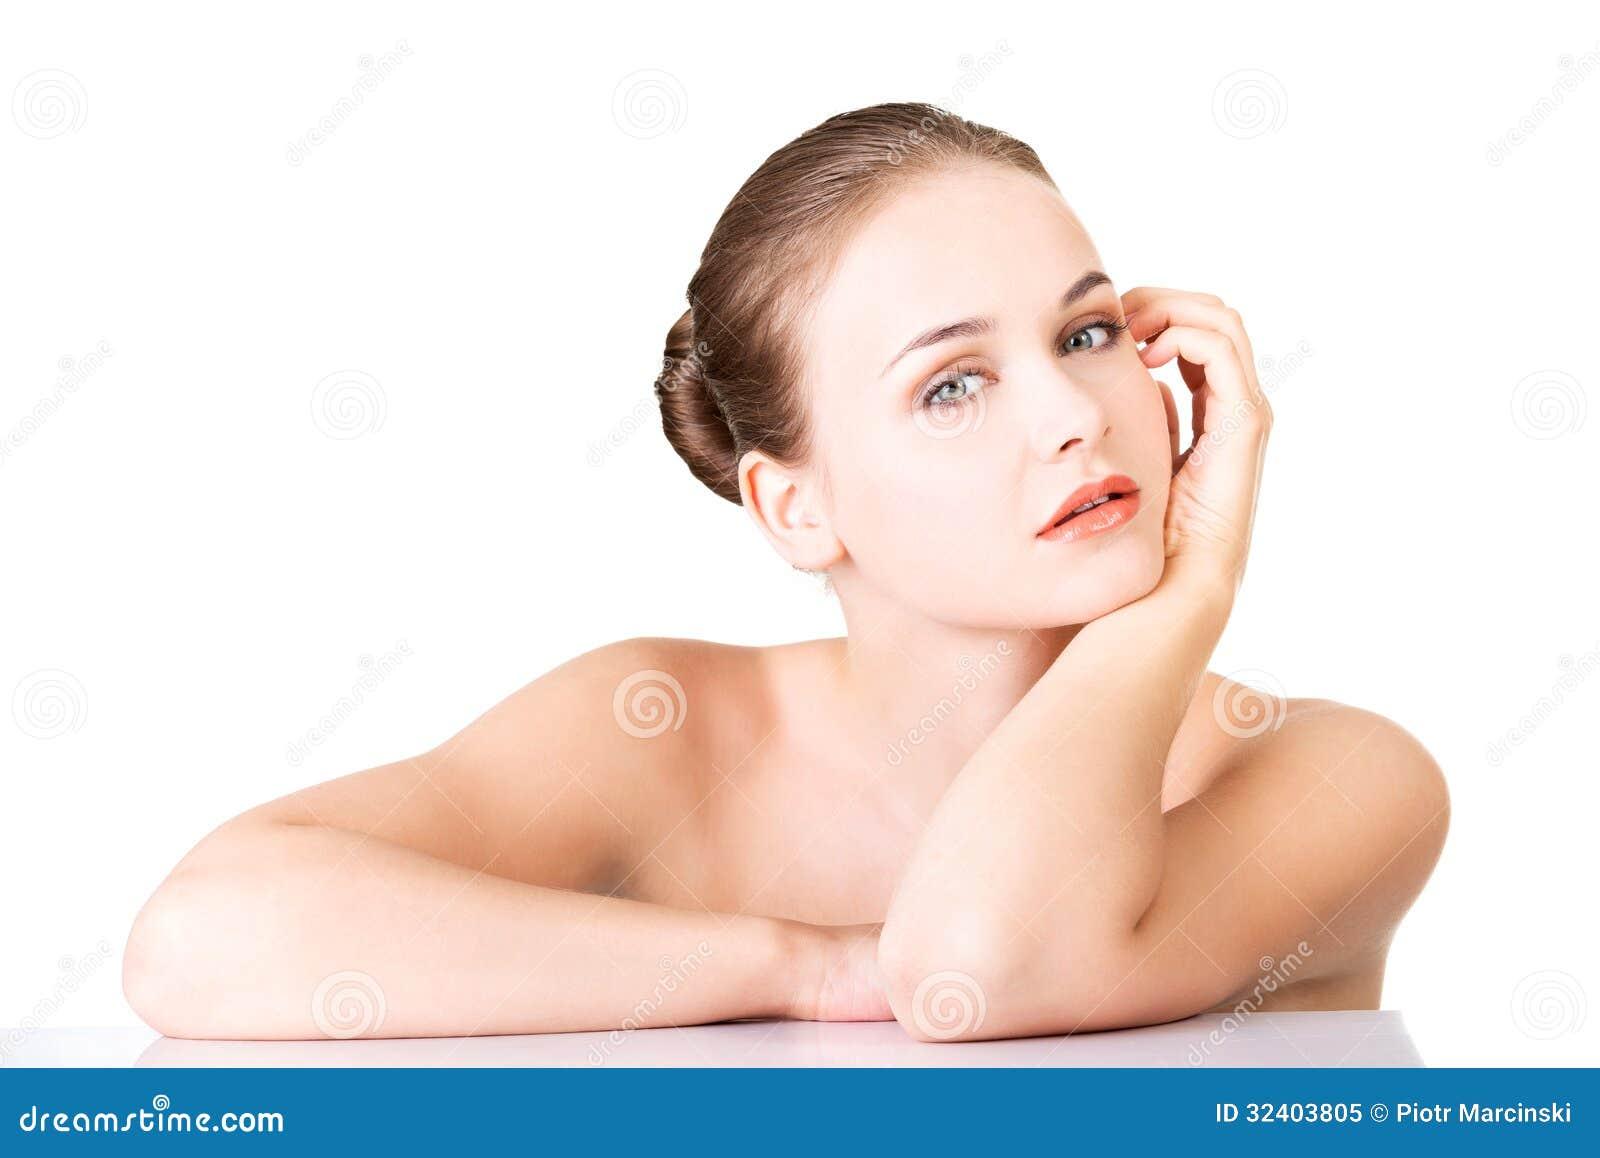 Ashiwarya nude picture